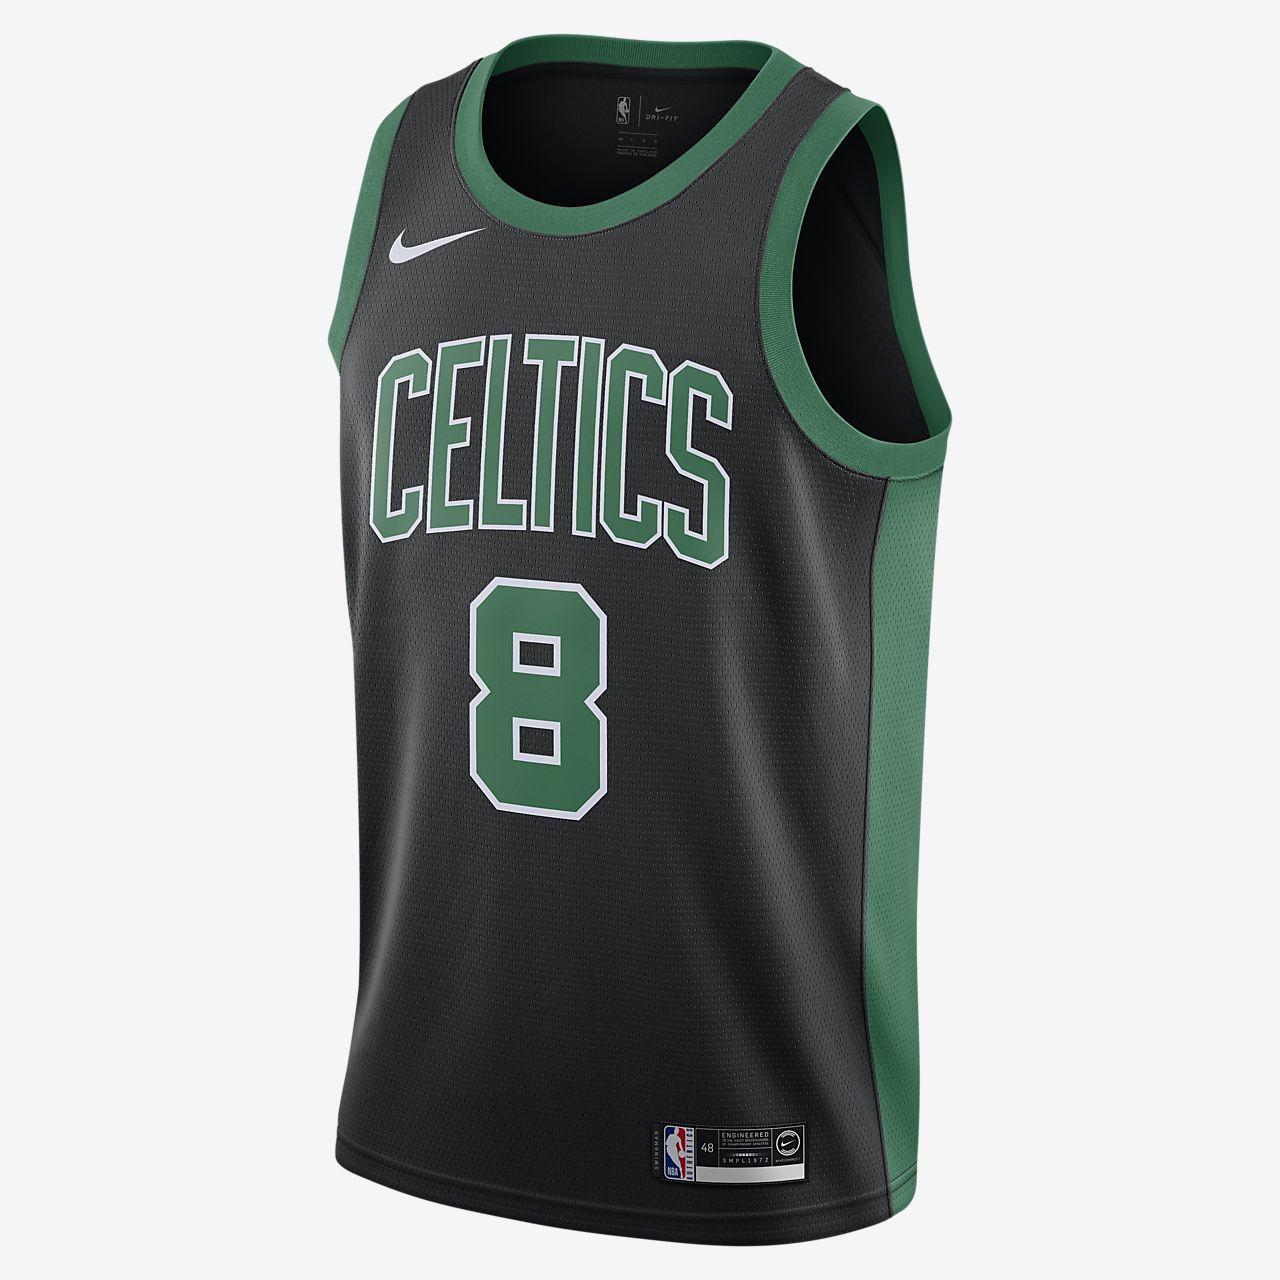 Koszulka Nike NBA Swingman Kemba Walker Celtics Statement Edition